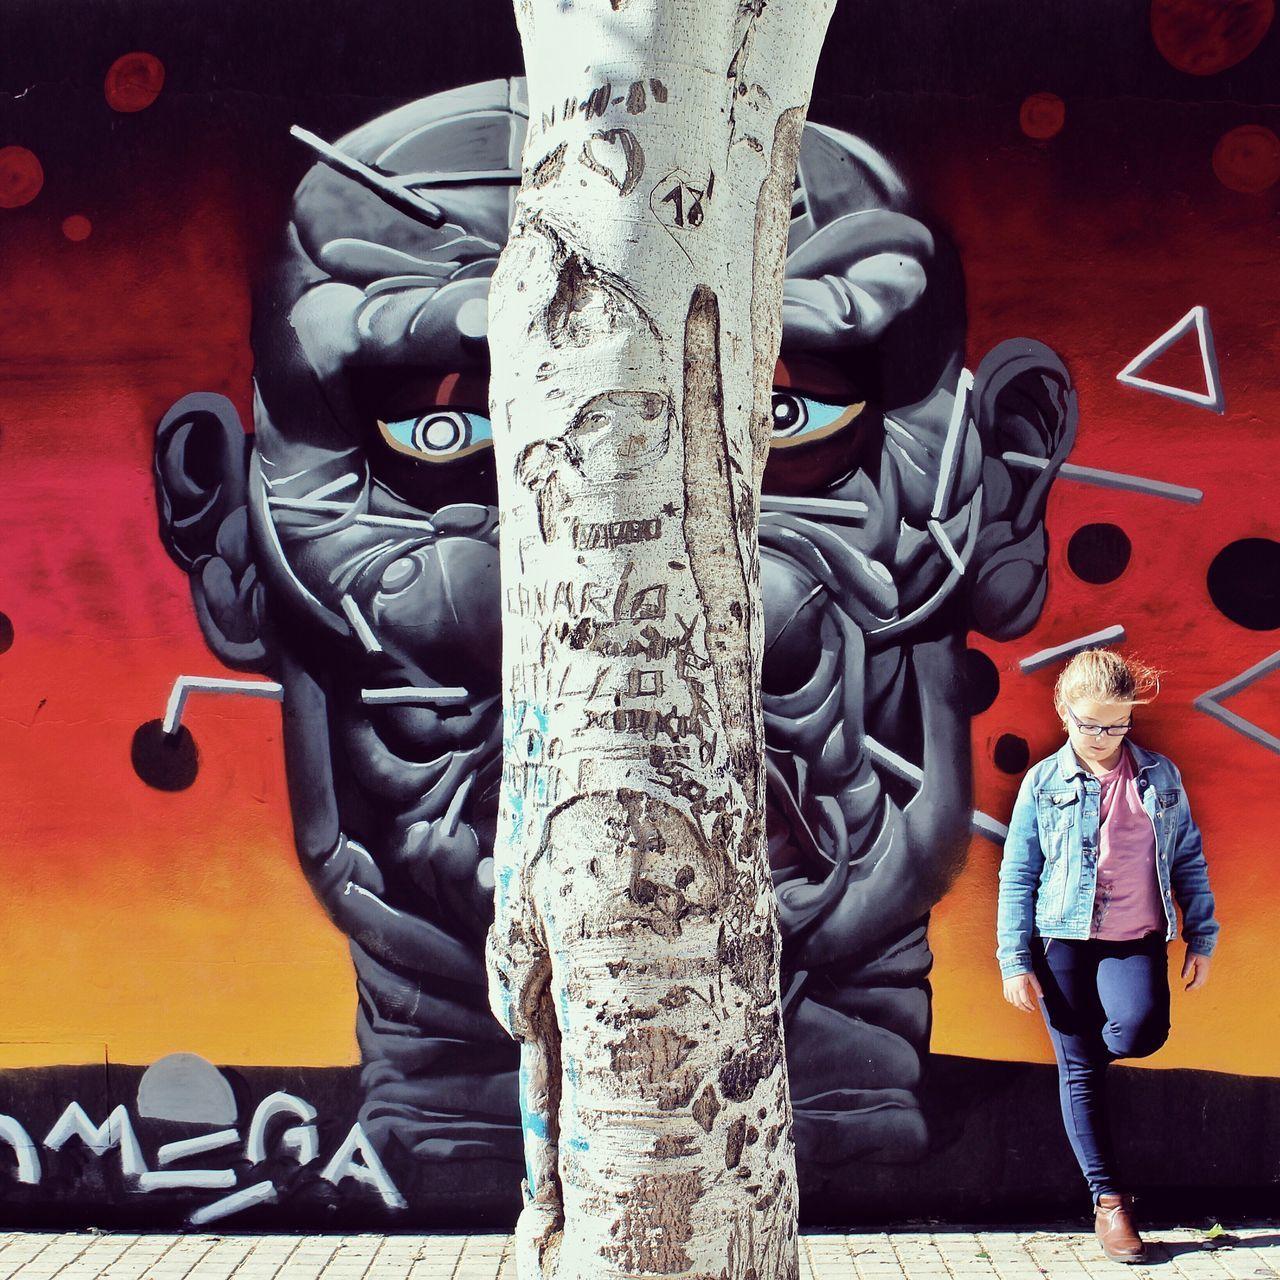 Graffiti Lifestyles People Two People Sword Headwear Shield Outdoors Day Adult